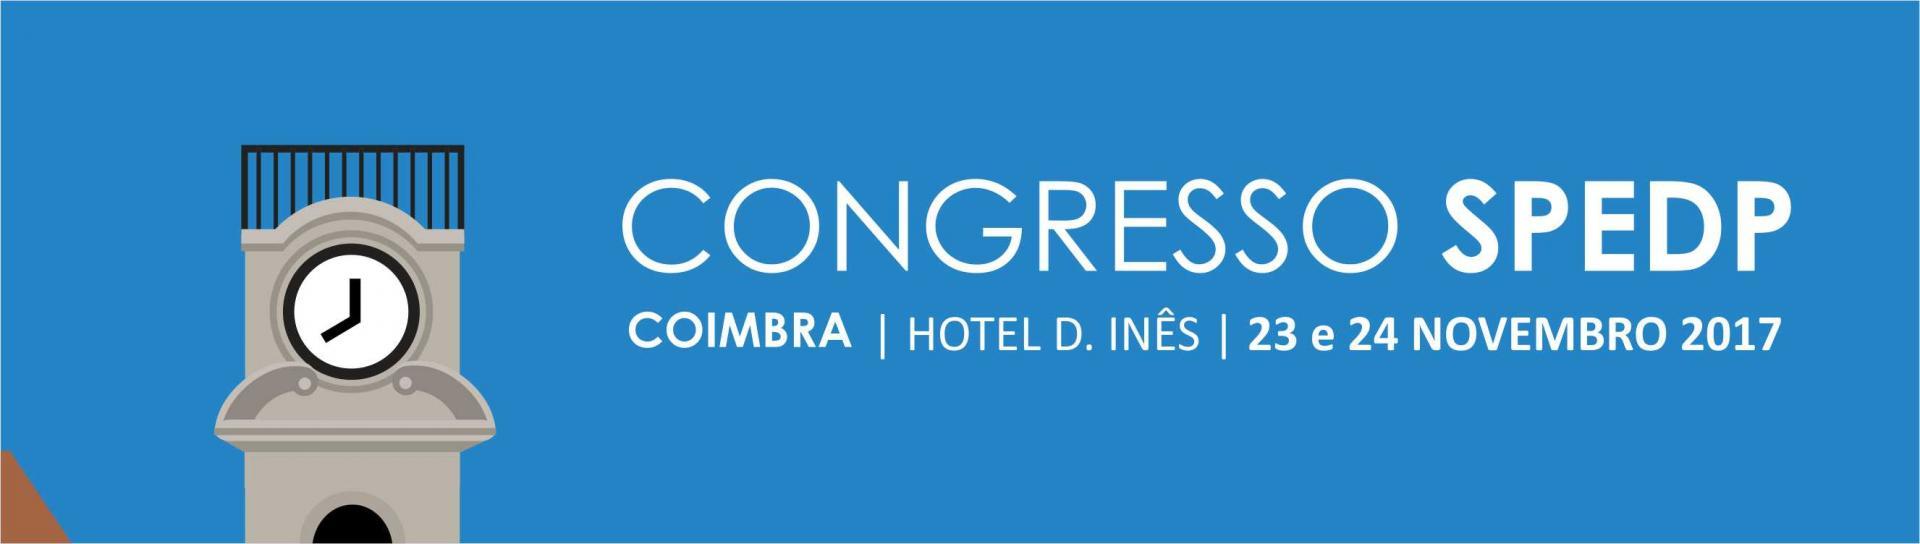 Congresso 2017